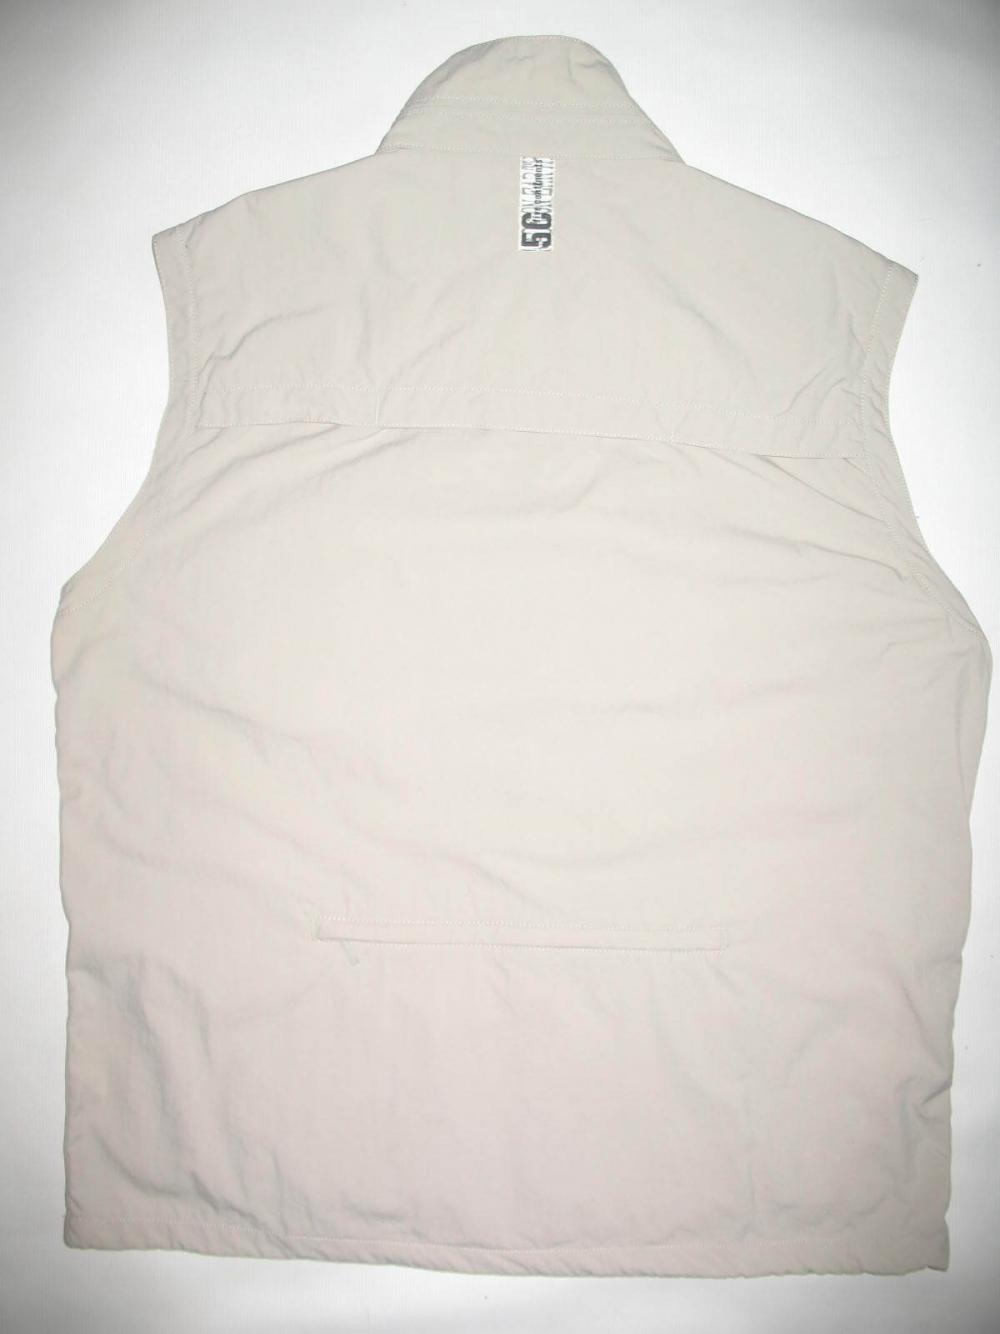 Жилет SALEWA quartz 5c dryton vest (размер 52-XL) - 3